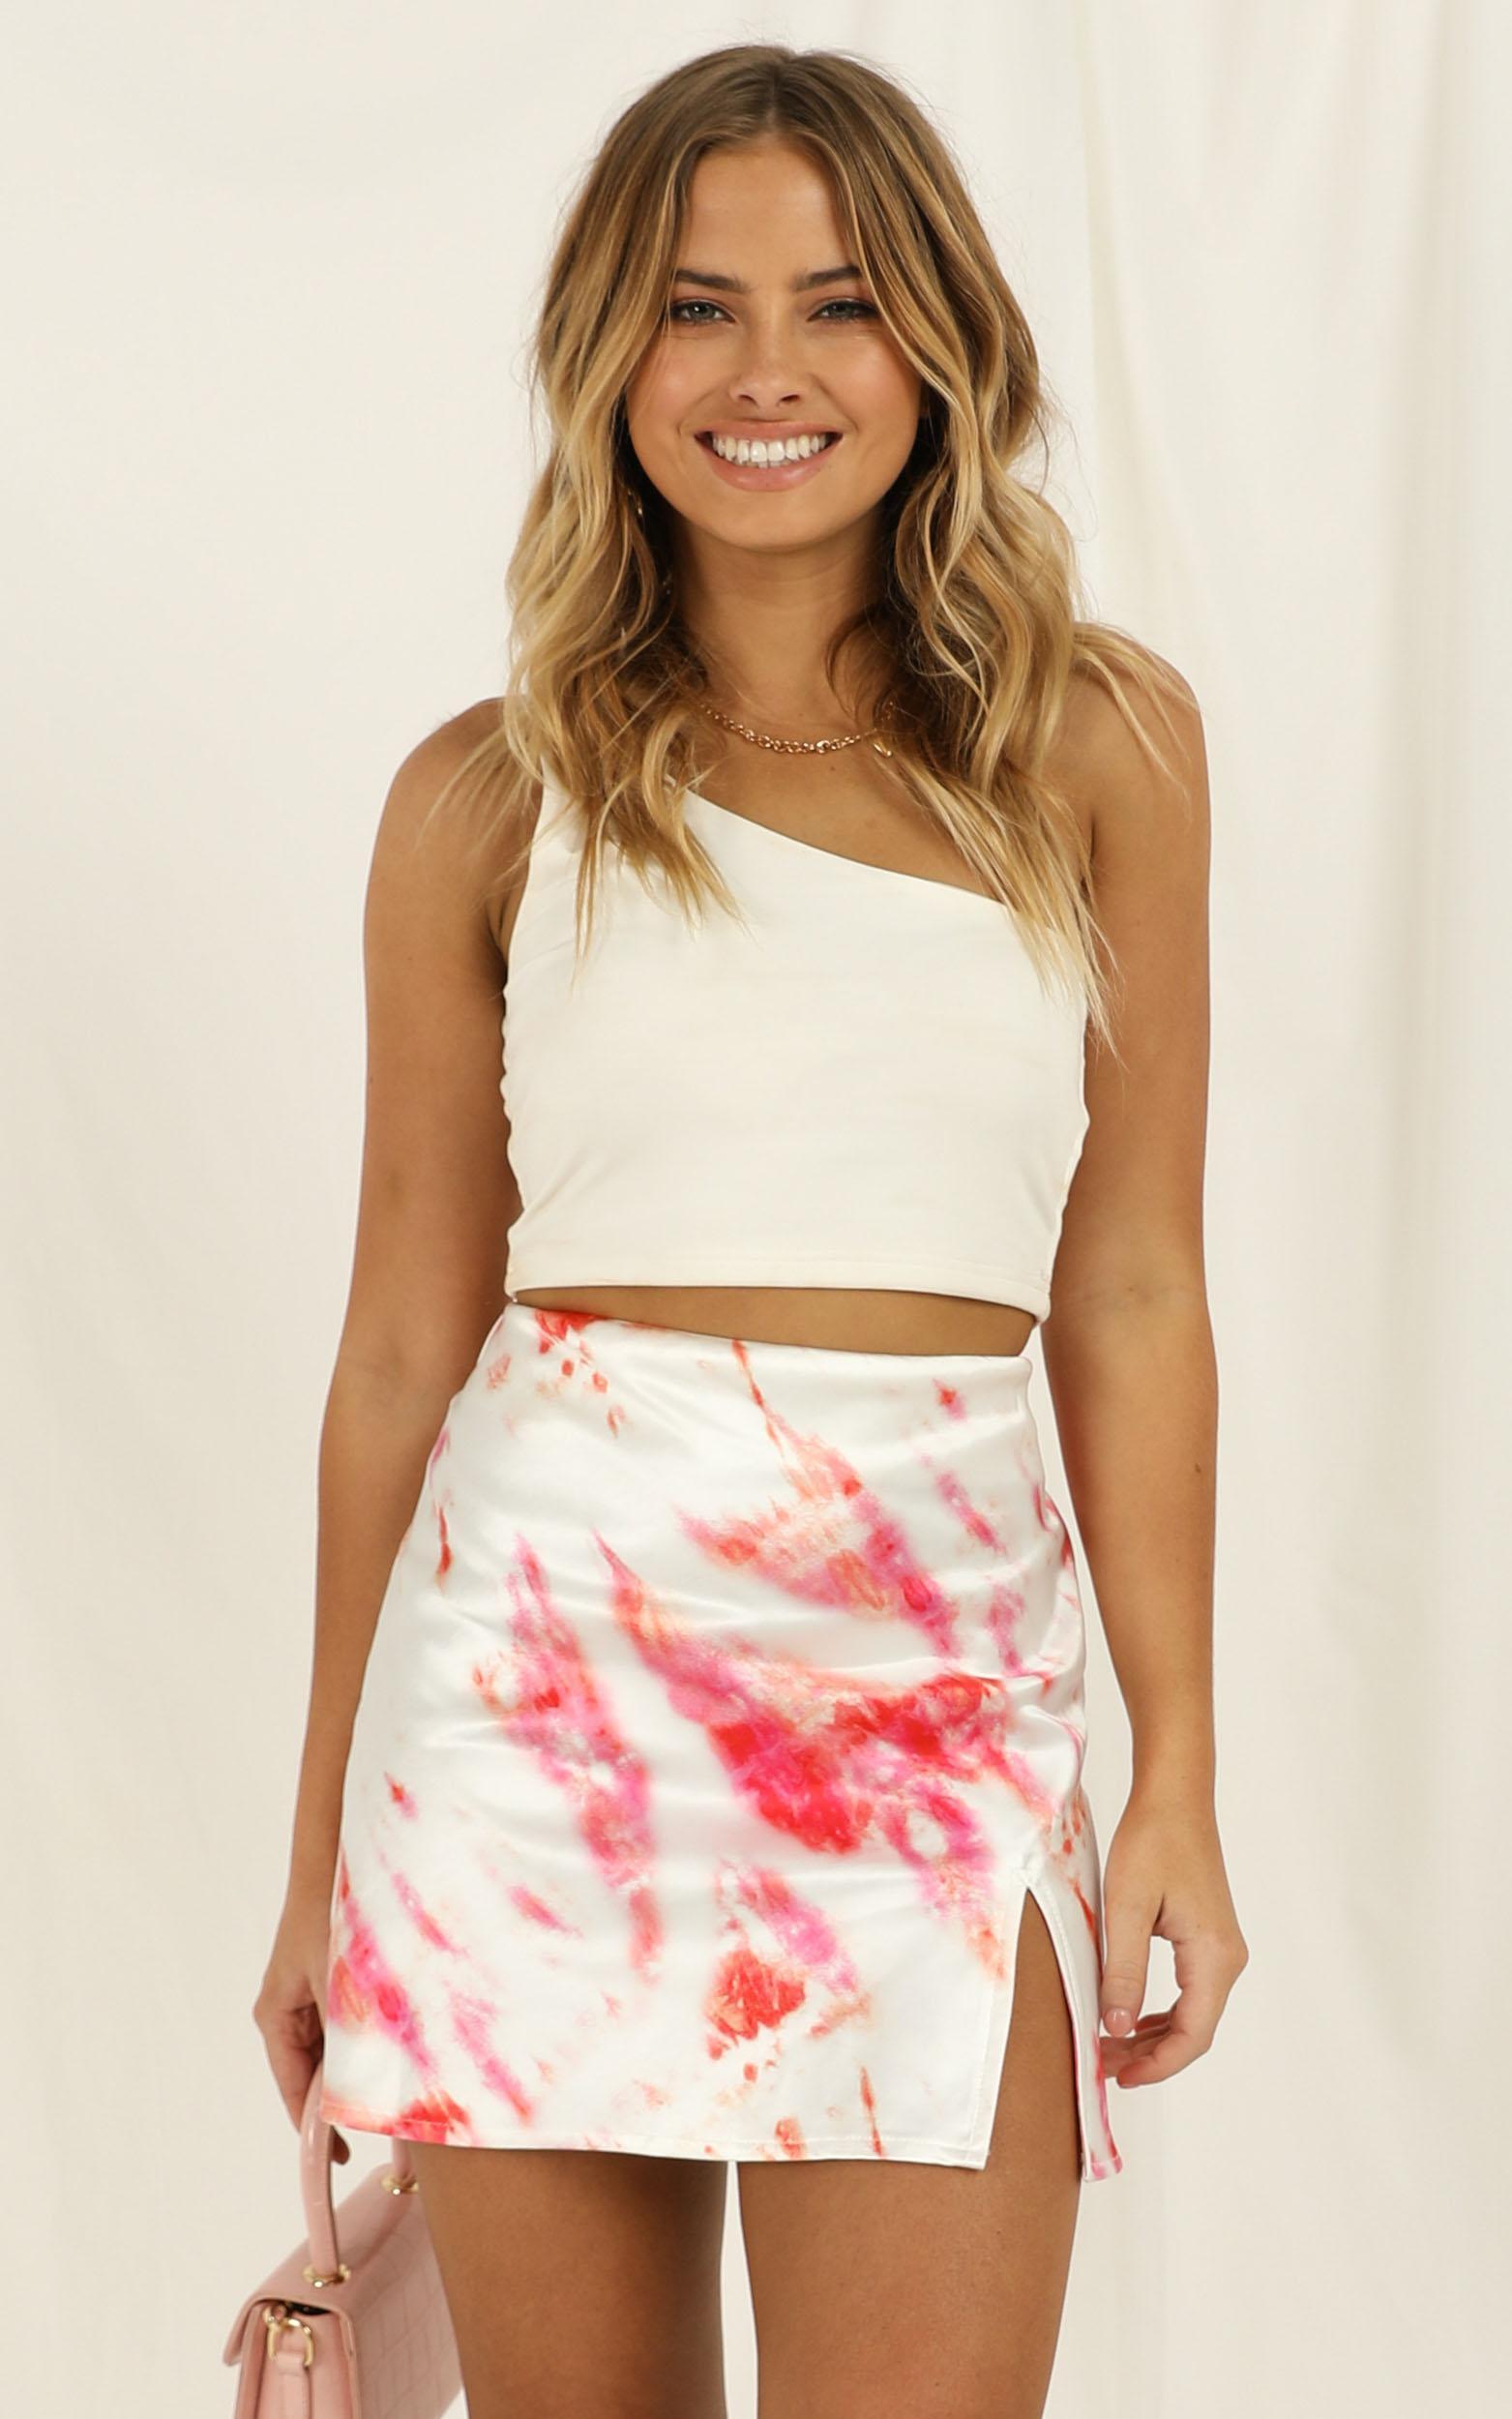 Alfie Skirt In Pink Tie Dye Satin - 4 (XXS), Pink, hi-res image number null